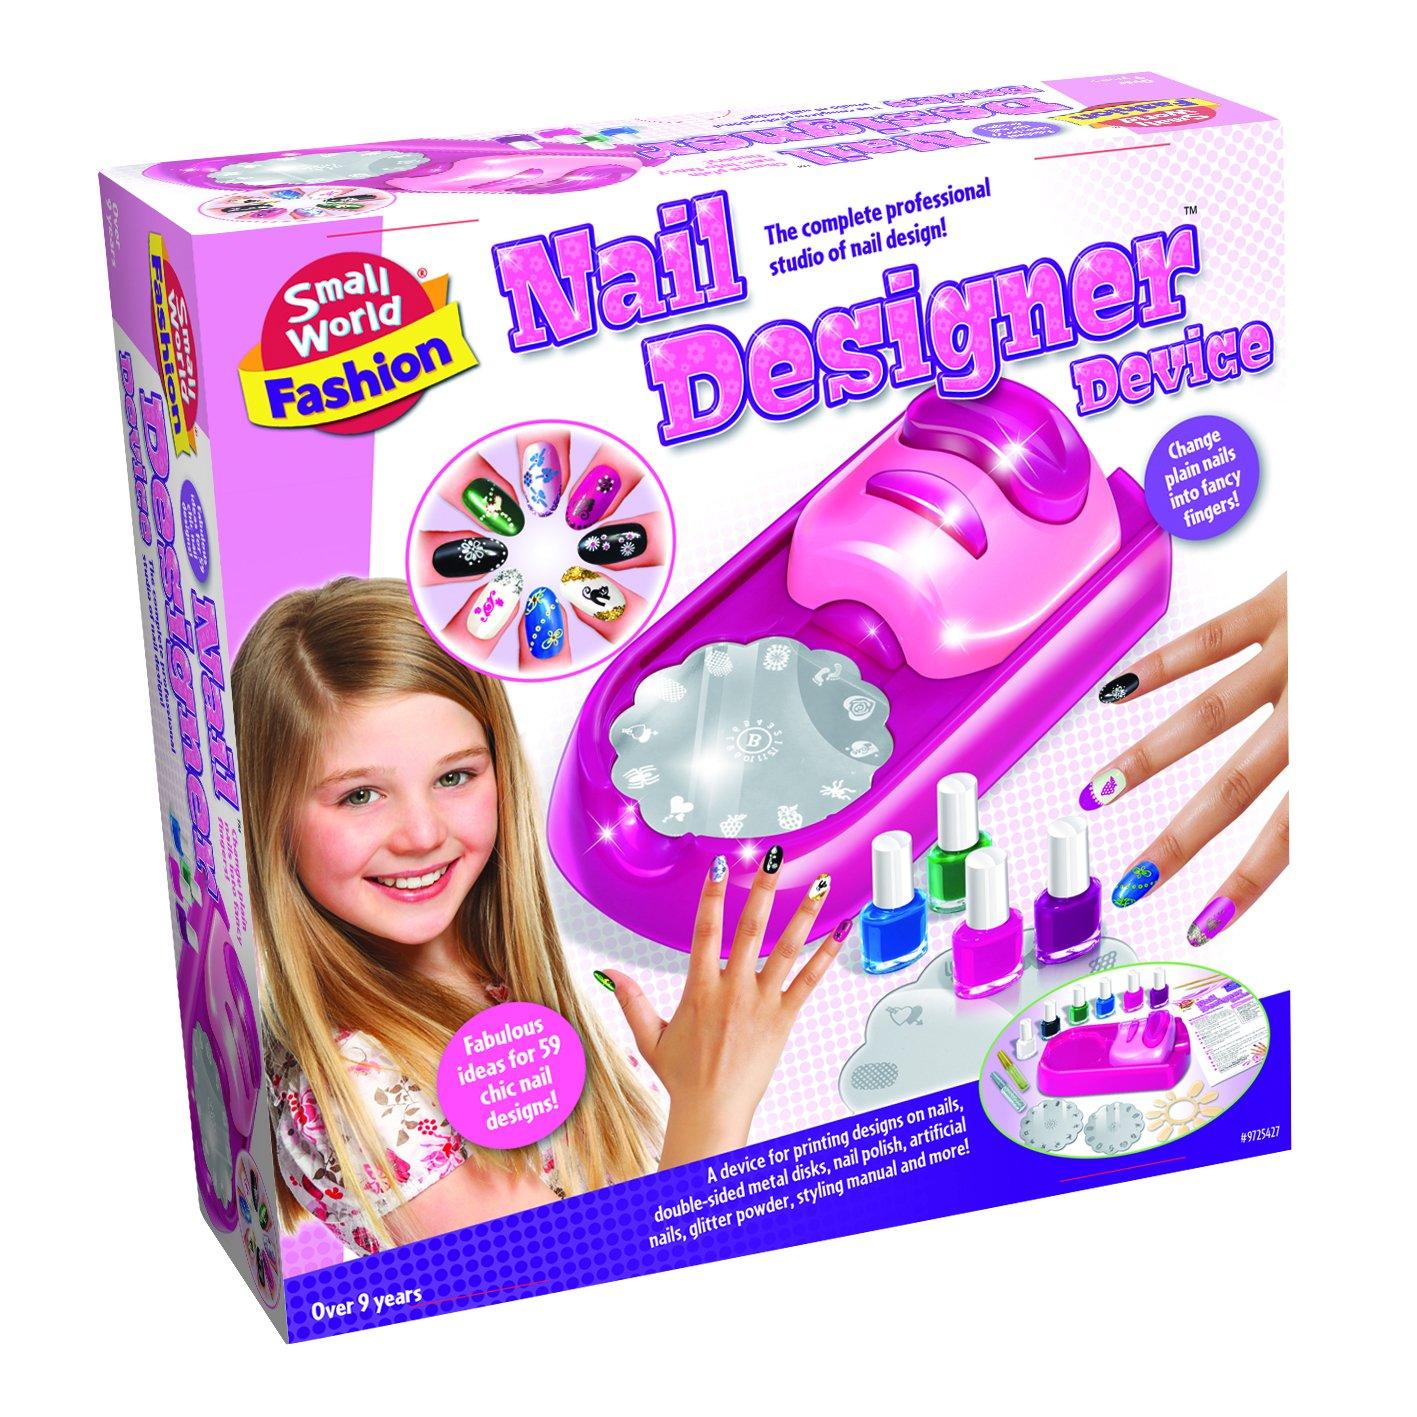 Amazon.com: Small World Toys Fashion - Nail Designer Device Makeup ...